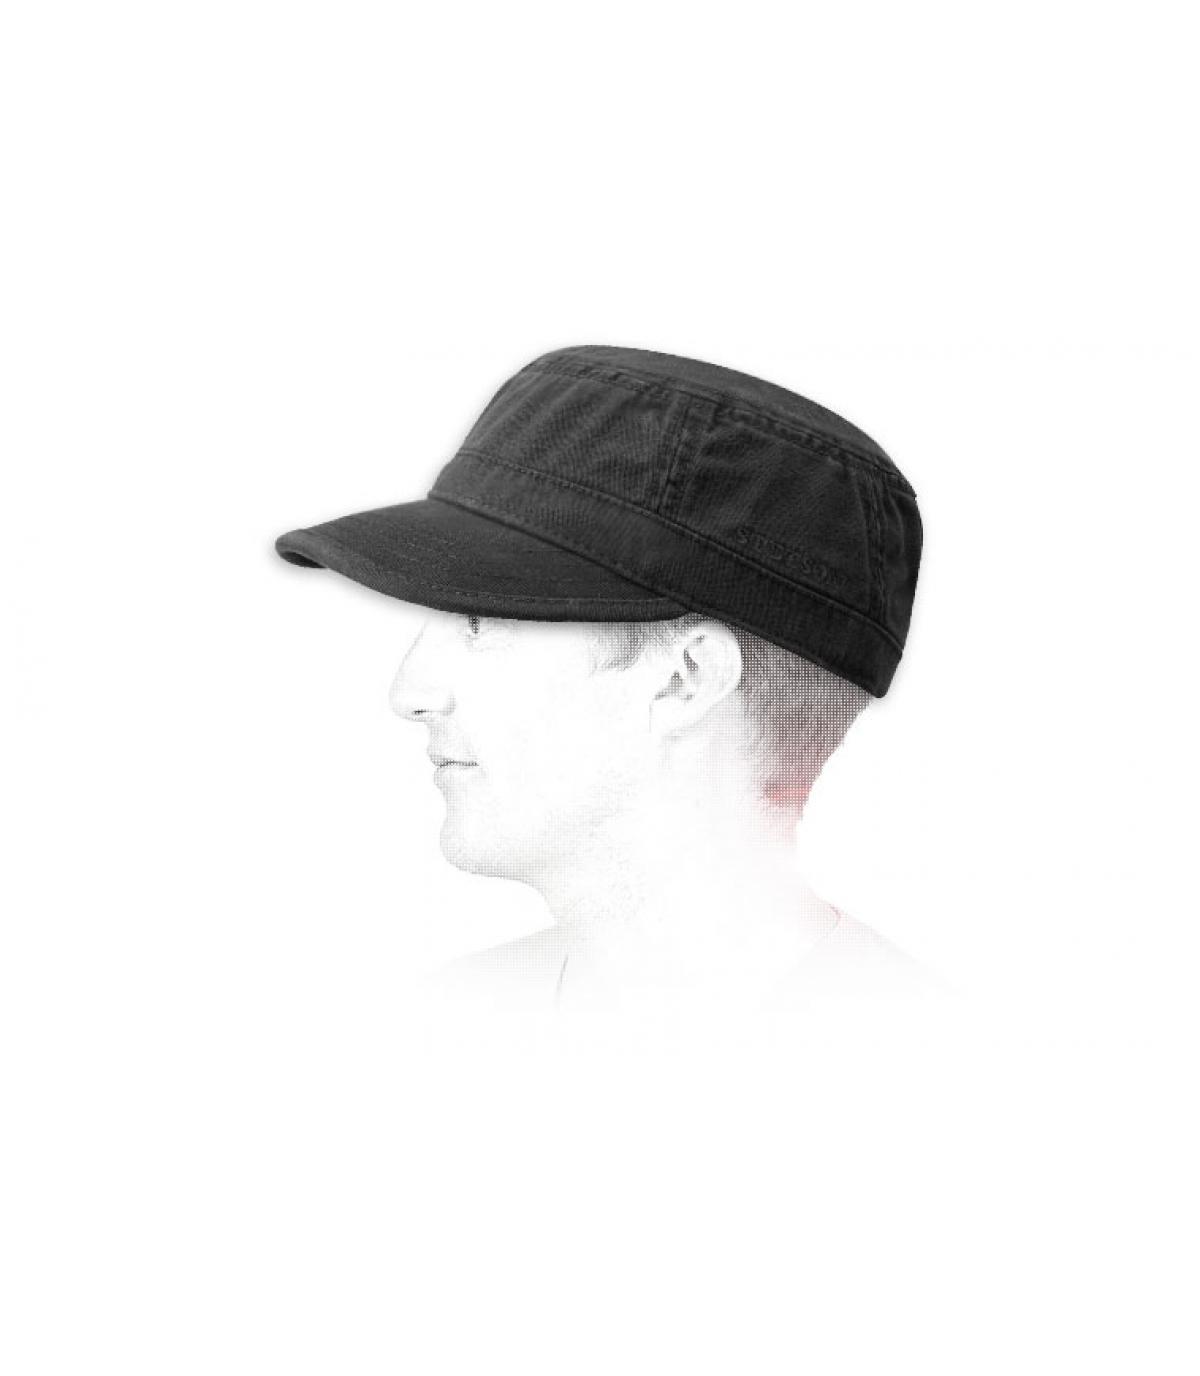 Basic army cap stetson - Gosper black by Stetson 133c737cd6d